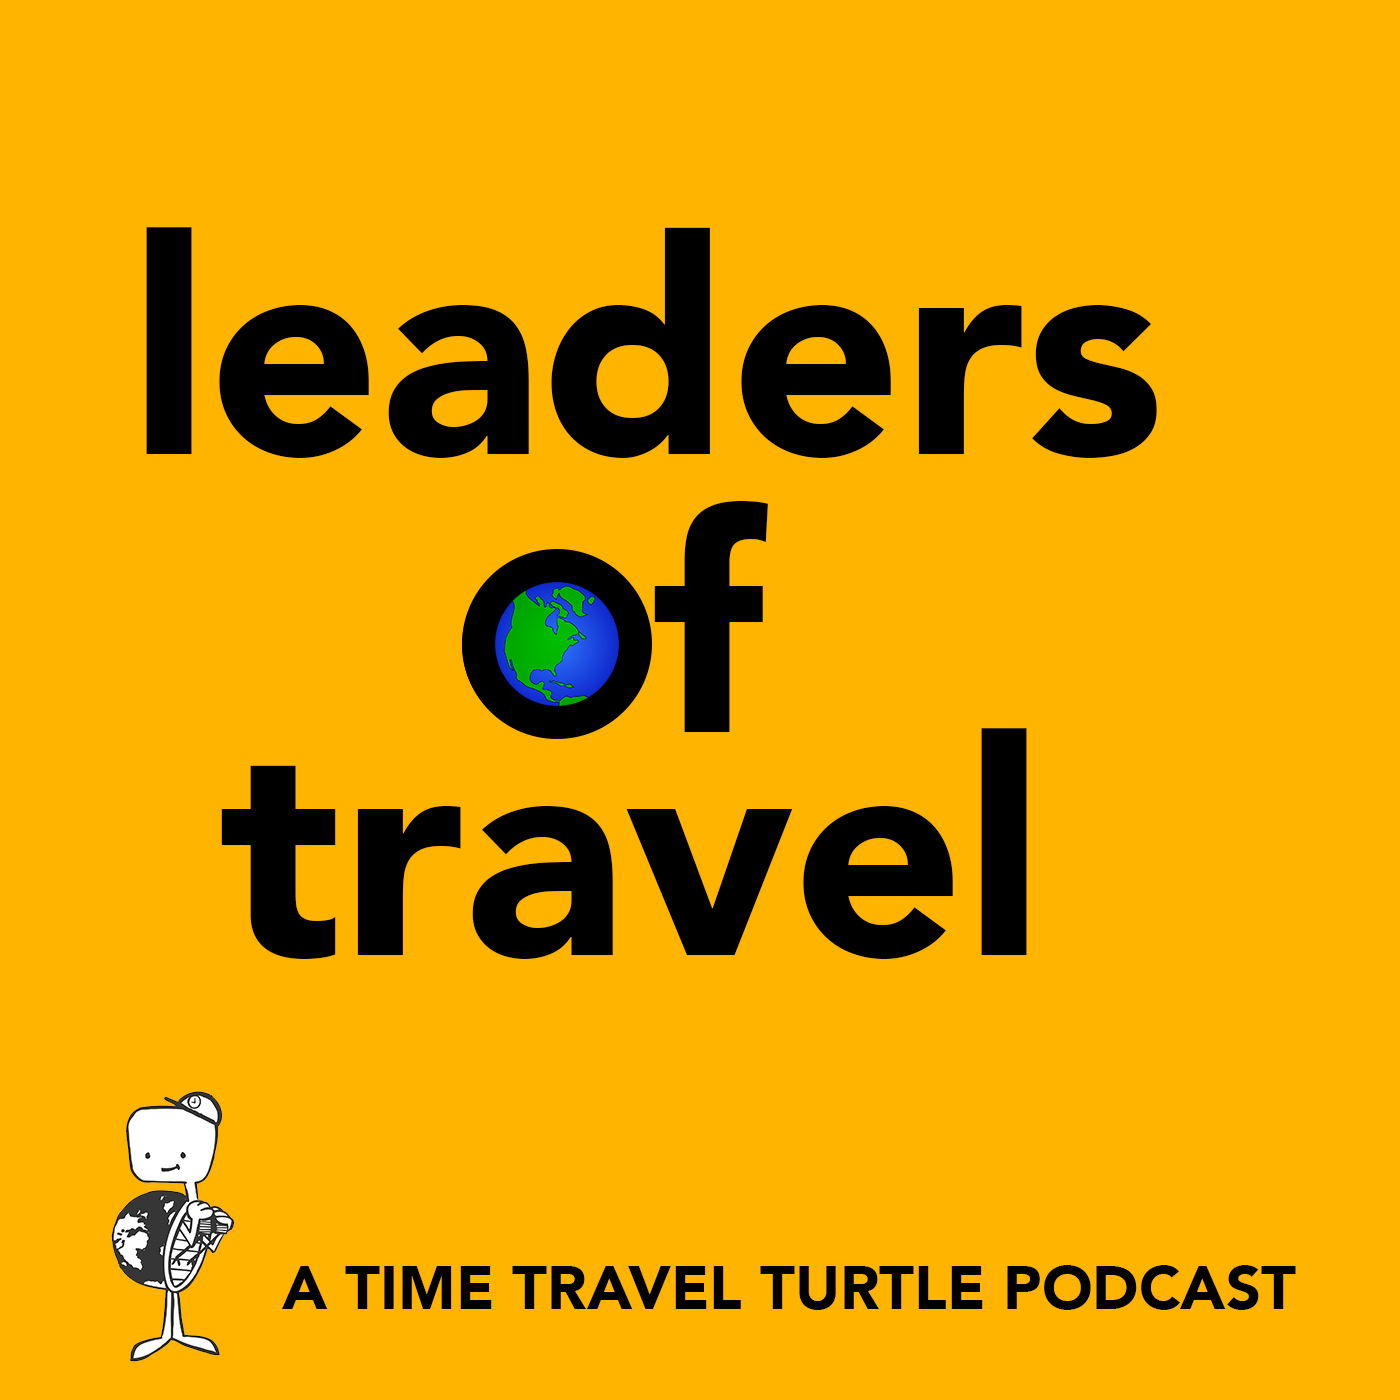 Leaders of Travel